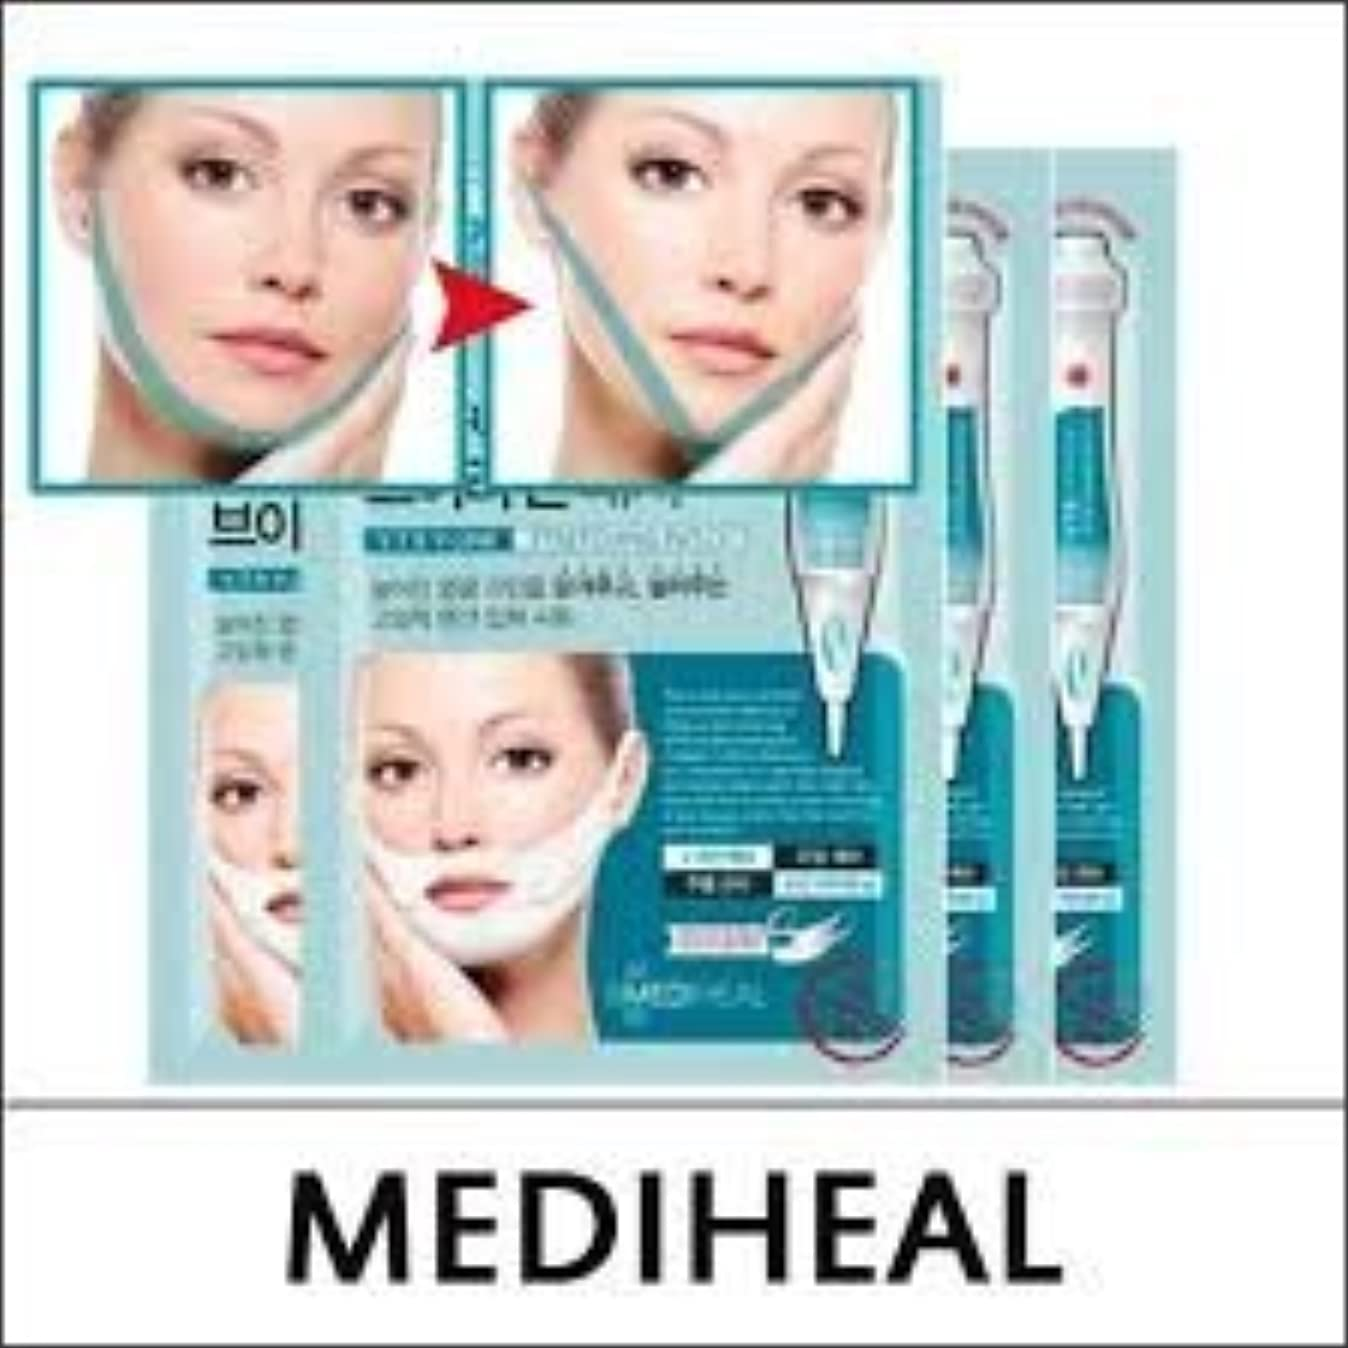 ピーブ全能個性MEDIHEAL VTR V Stretching Patch 20mlX4pcs/A.R.P Neck Patch/100% Authentic Korea Cosmetic (VTR V-Line Stretching Patch) [並行輸入品]